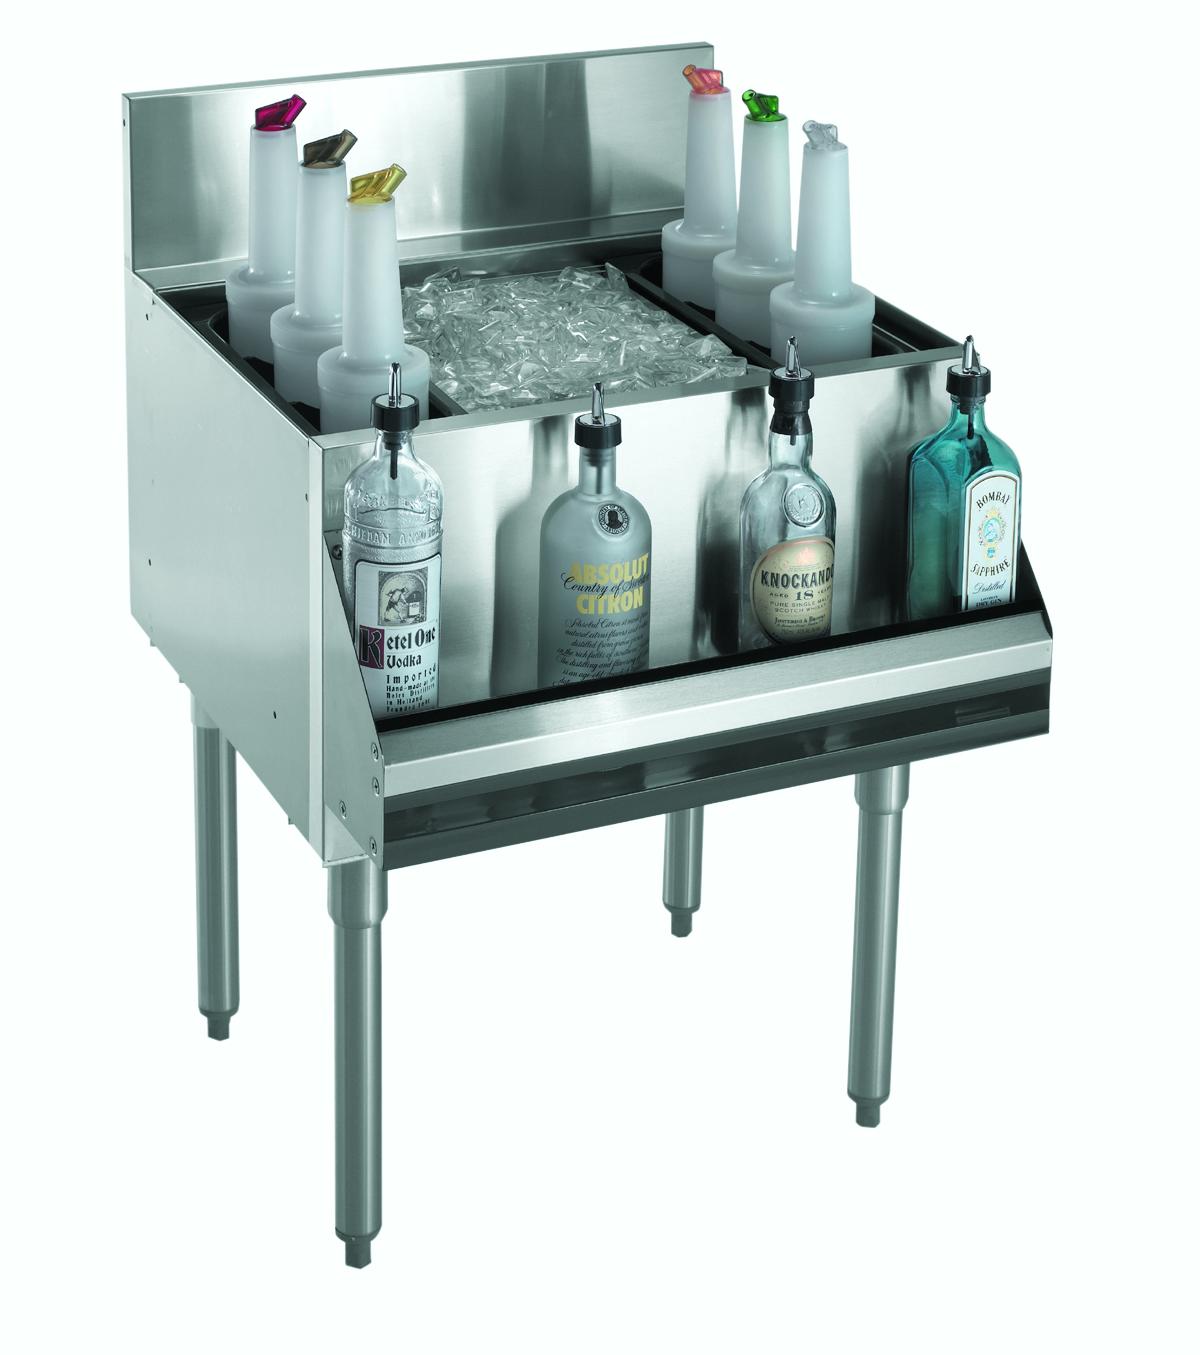 Krowne Metal KR21-24-10 underbar ice bin/cocktail unit